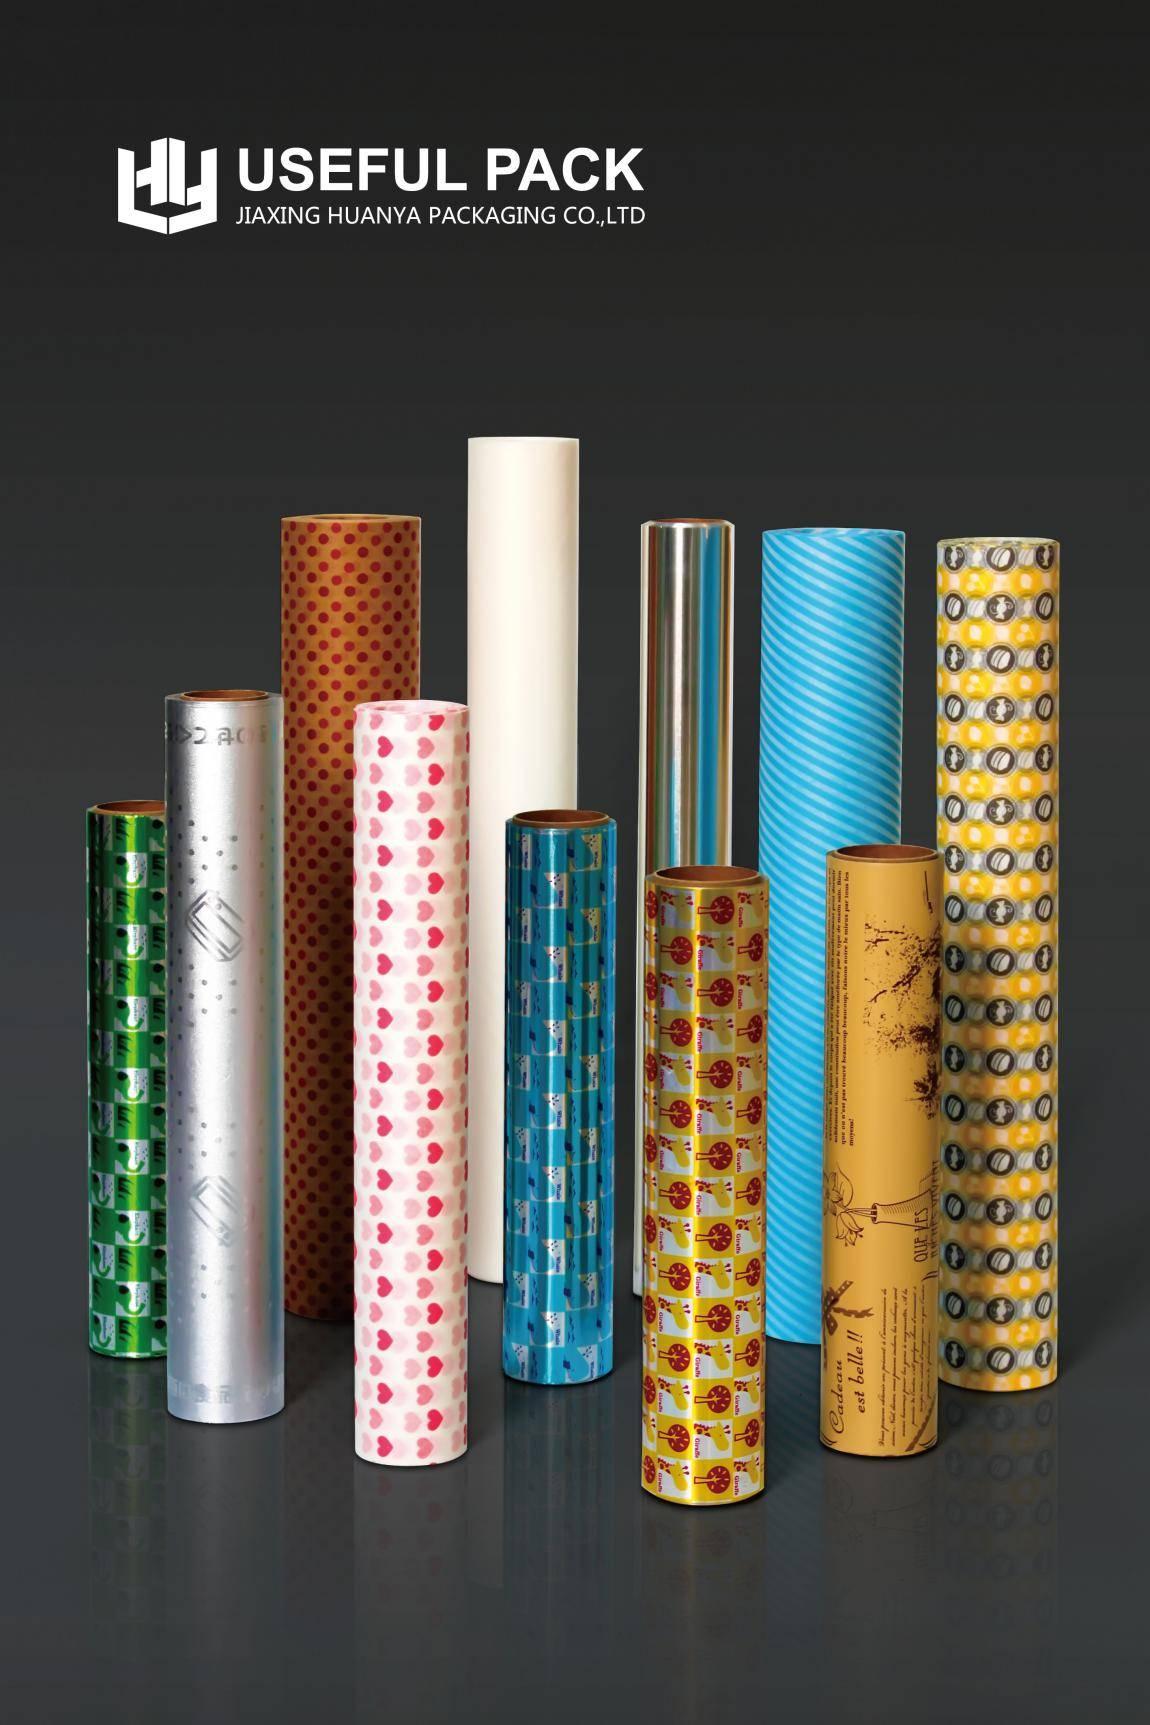 Alumin Foil/Paper Wrap